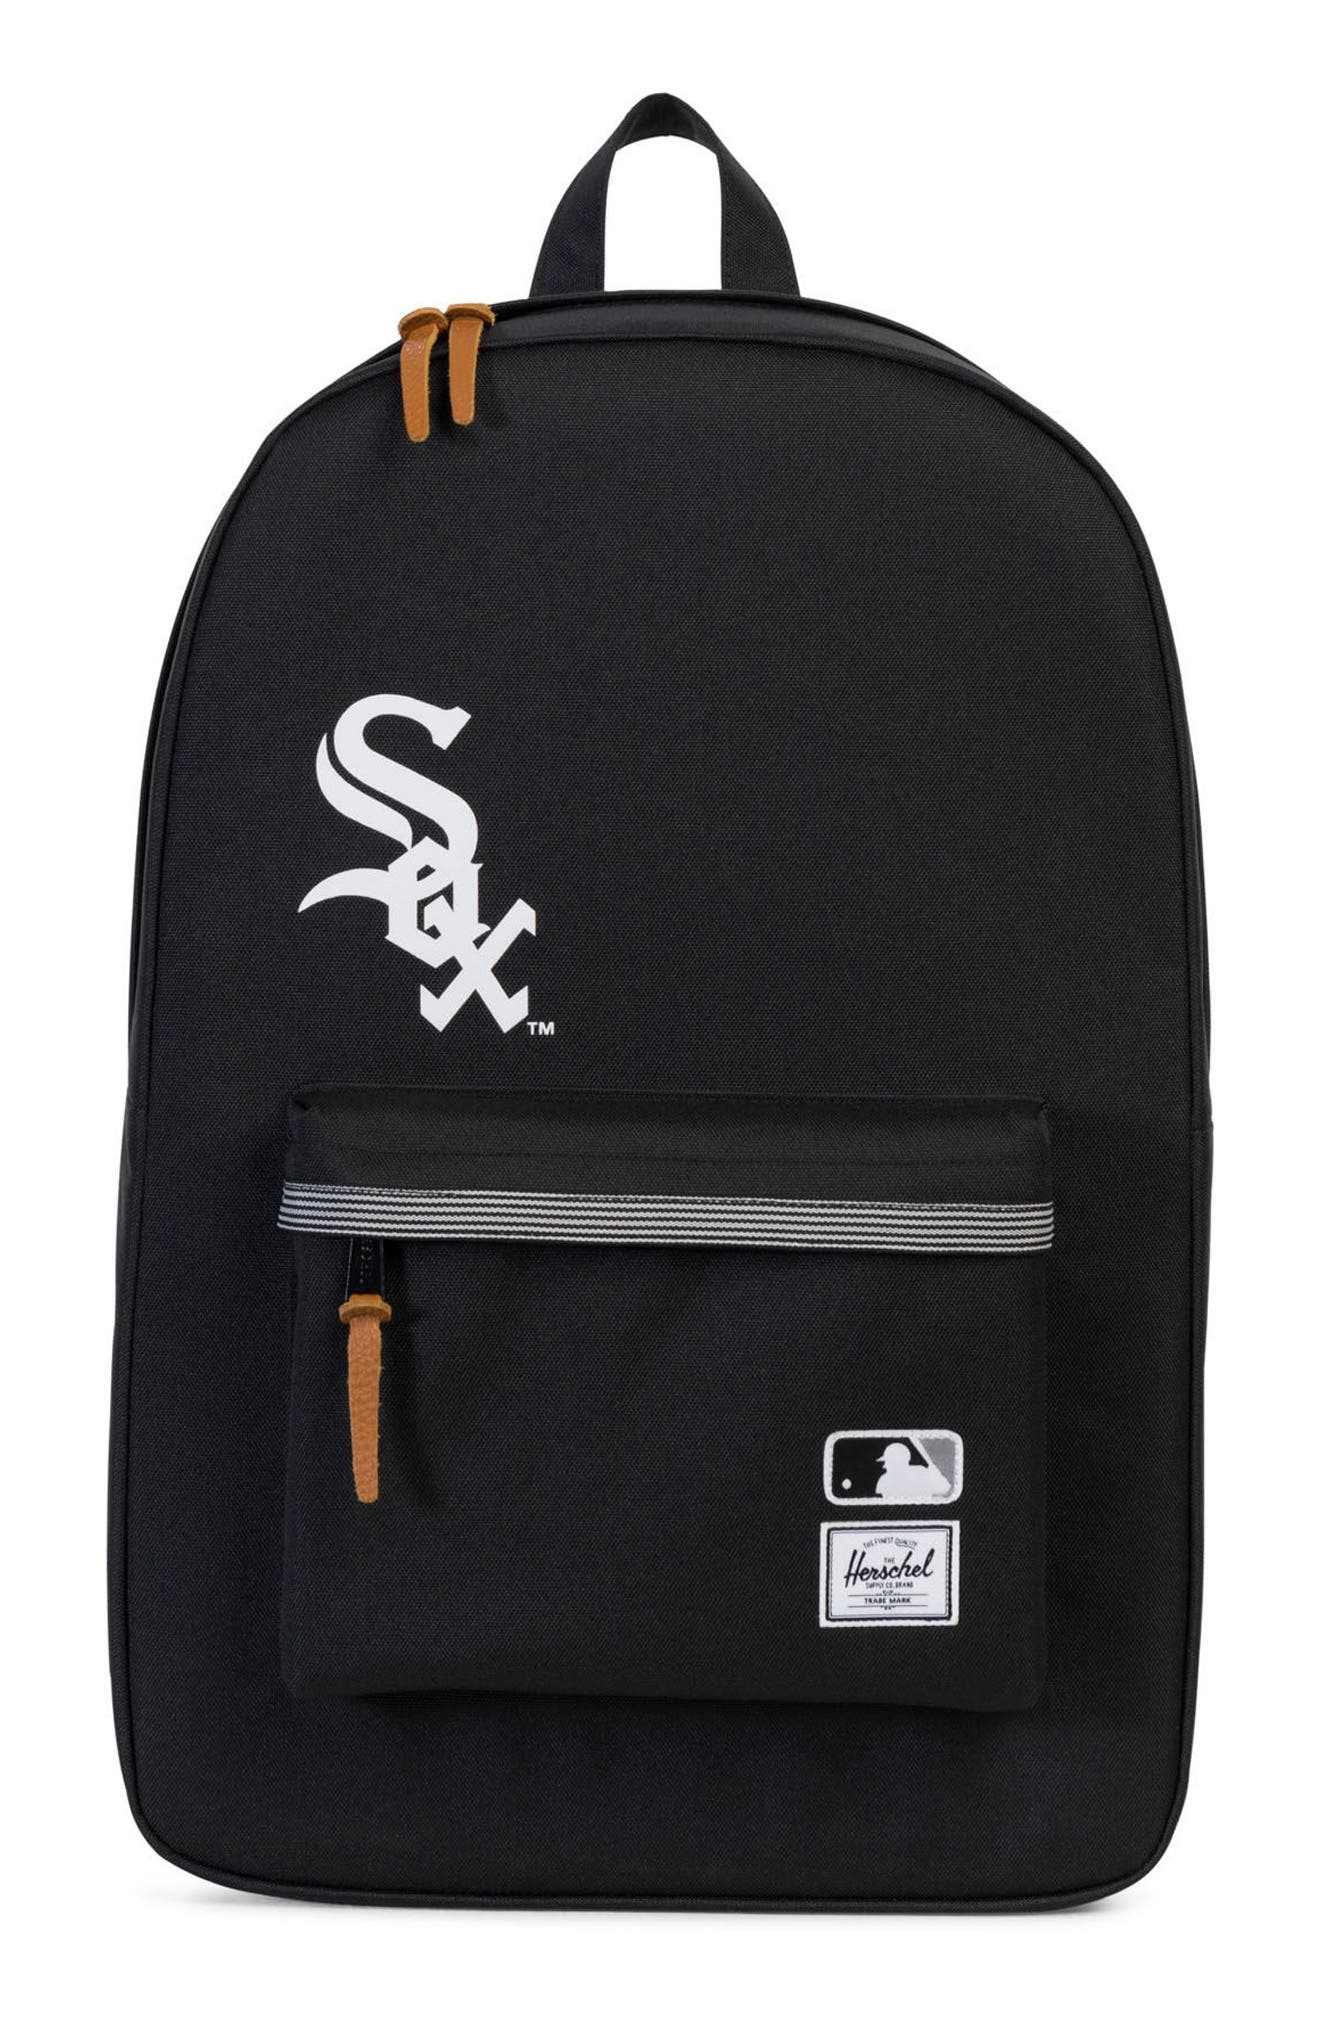 Herschel Supply Co. Heritage Chicago White Sox Backpack - Black